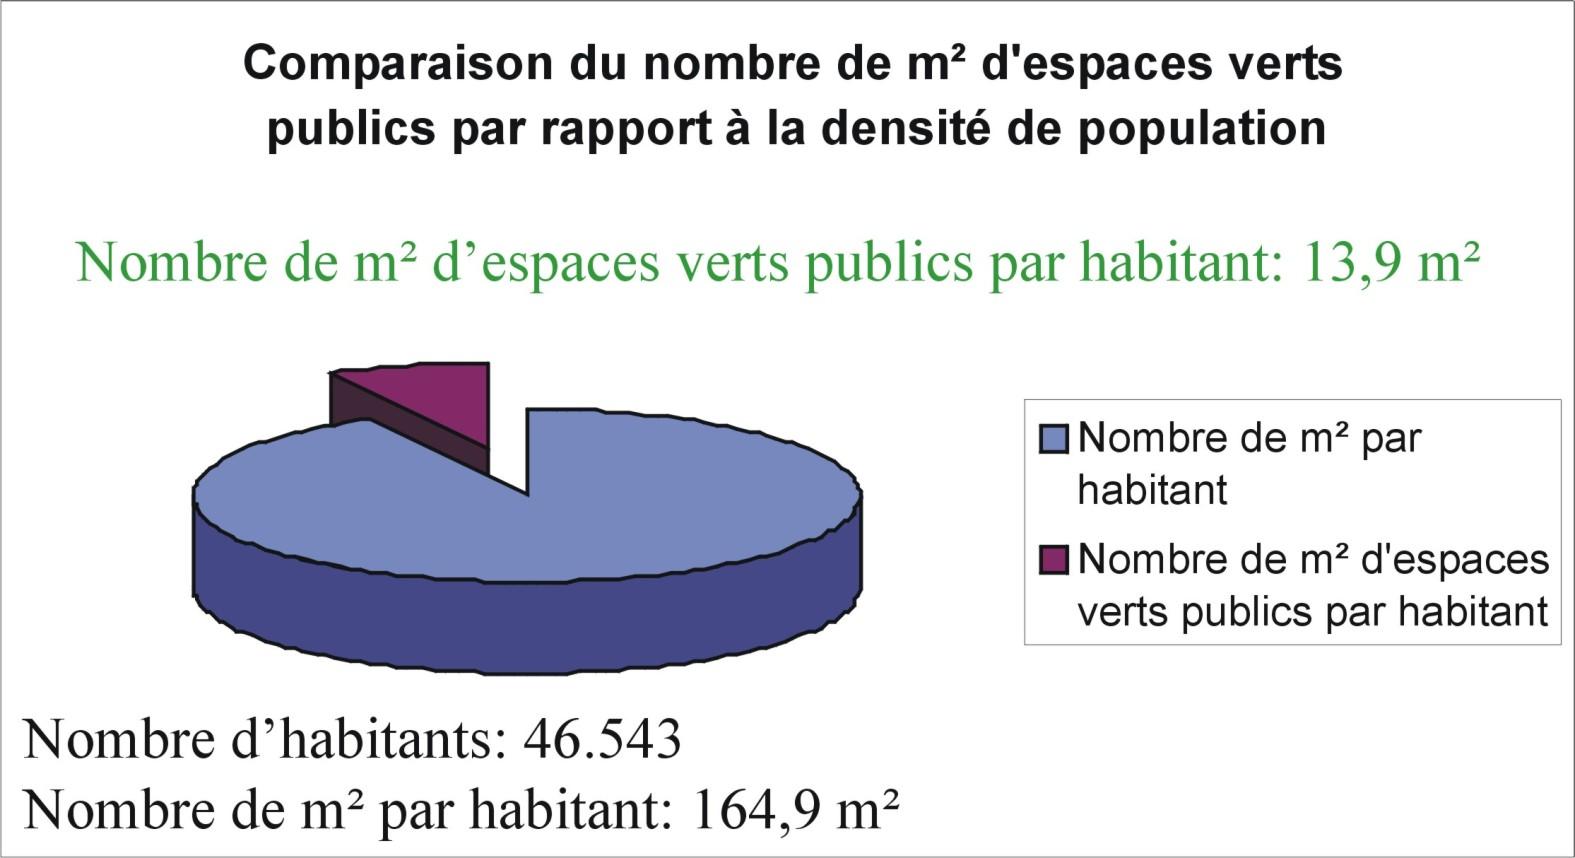 Zones vertes et population